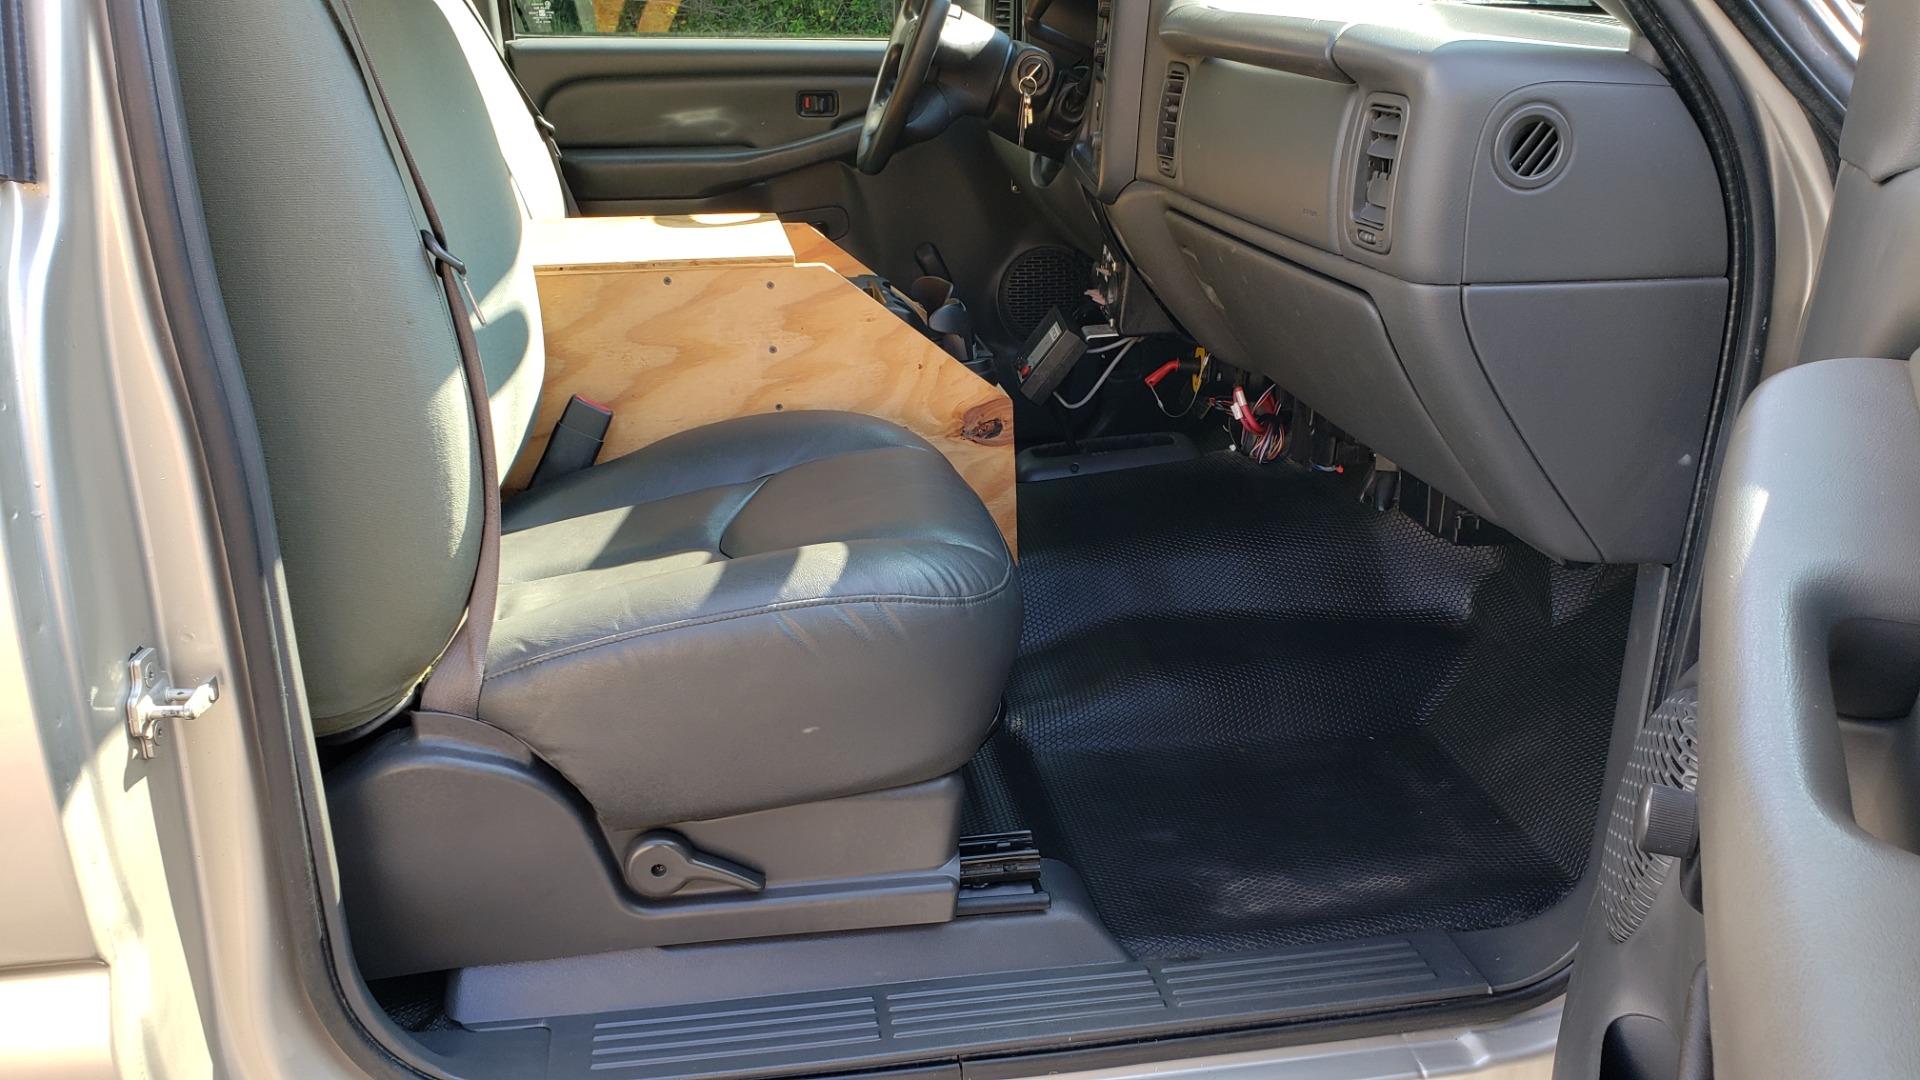 Used 2005 Chevrolet SILVERADO 3500 DRW / 4WD / REG CAB / 6.6L DURAMAX / DOOMSDAY PREPPER for sale $21,499 at Formula Imports in Charlotte NC 28227 25